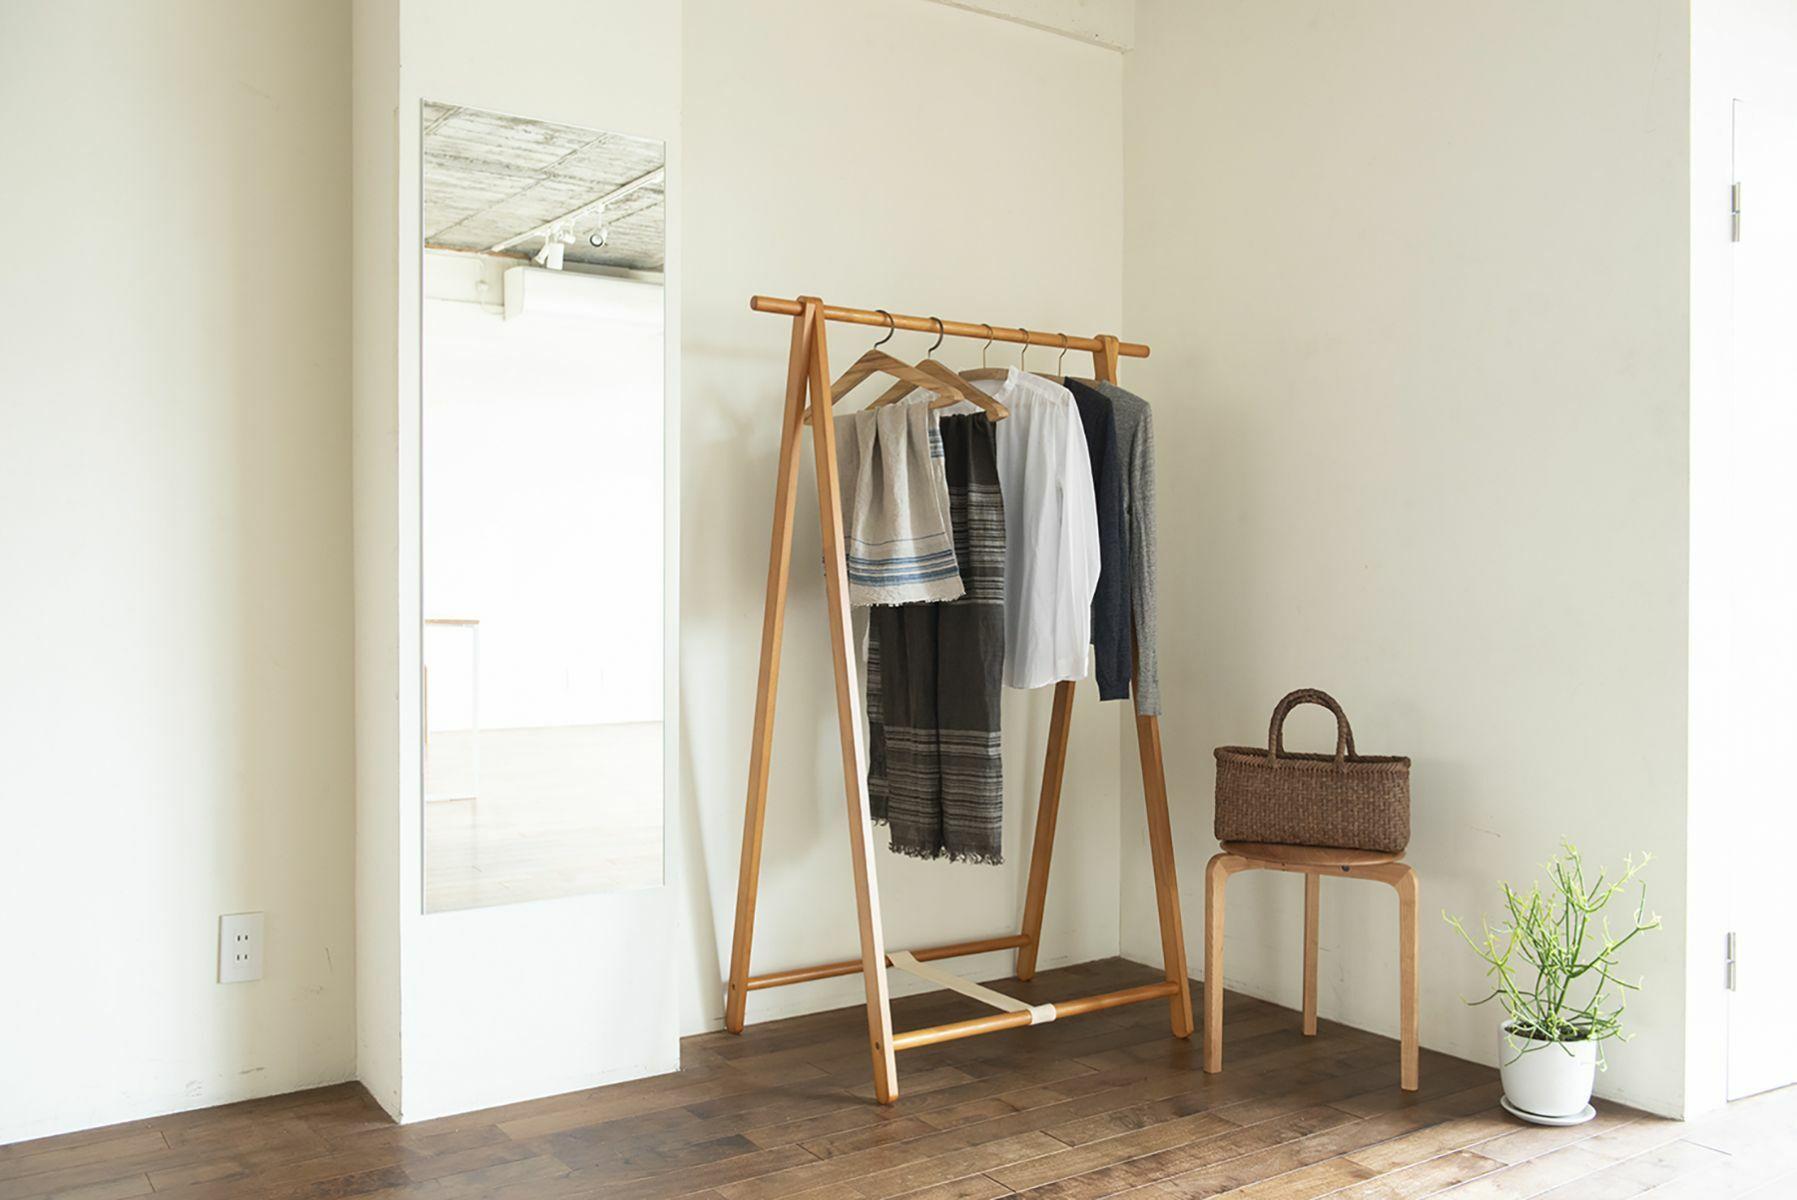 cobaco kitchen(コバコ キッチン)トイレ&押入れ